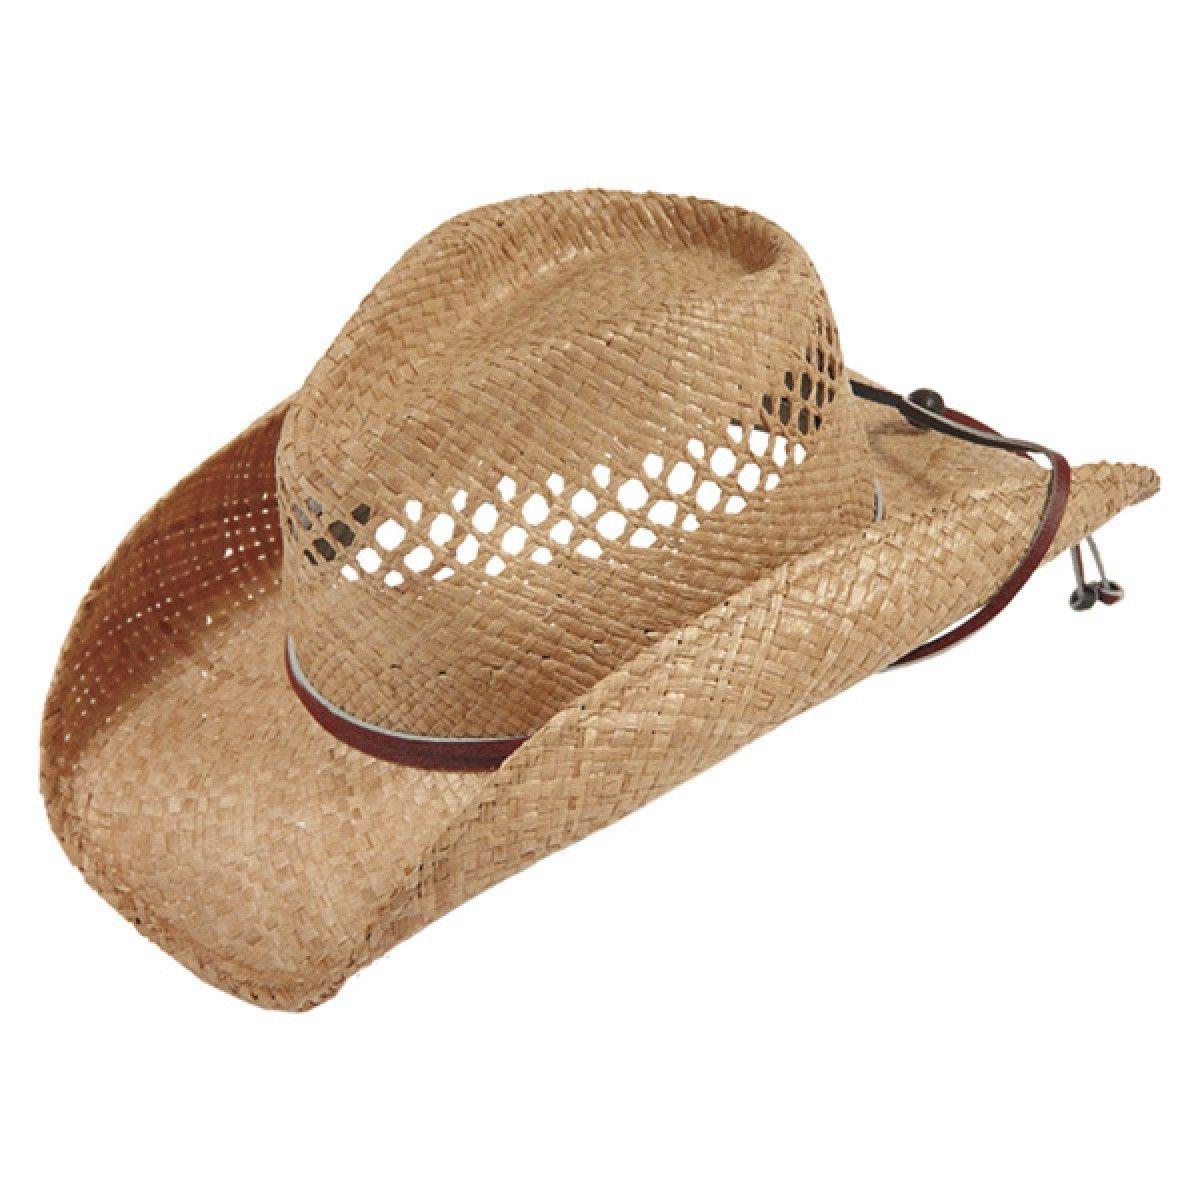 32f8f7e5a3568 Stetson Bridger - Shapeable Straw Cowboy Hat